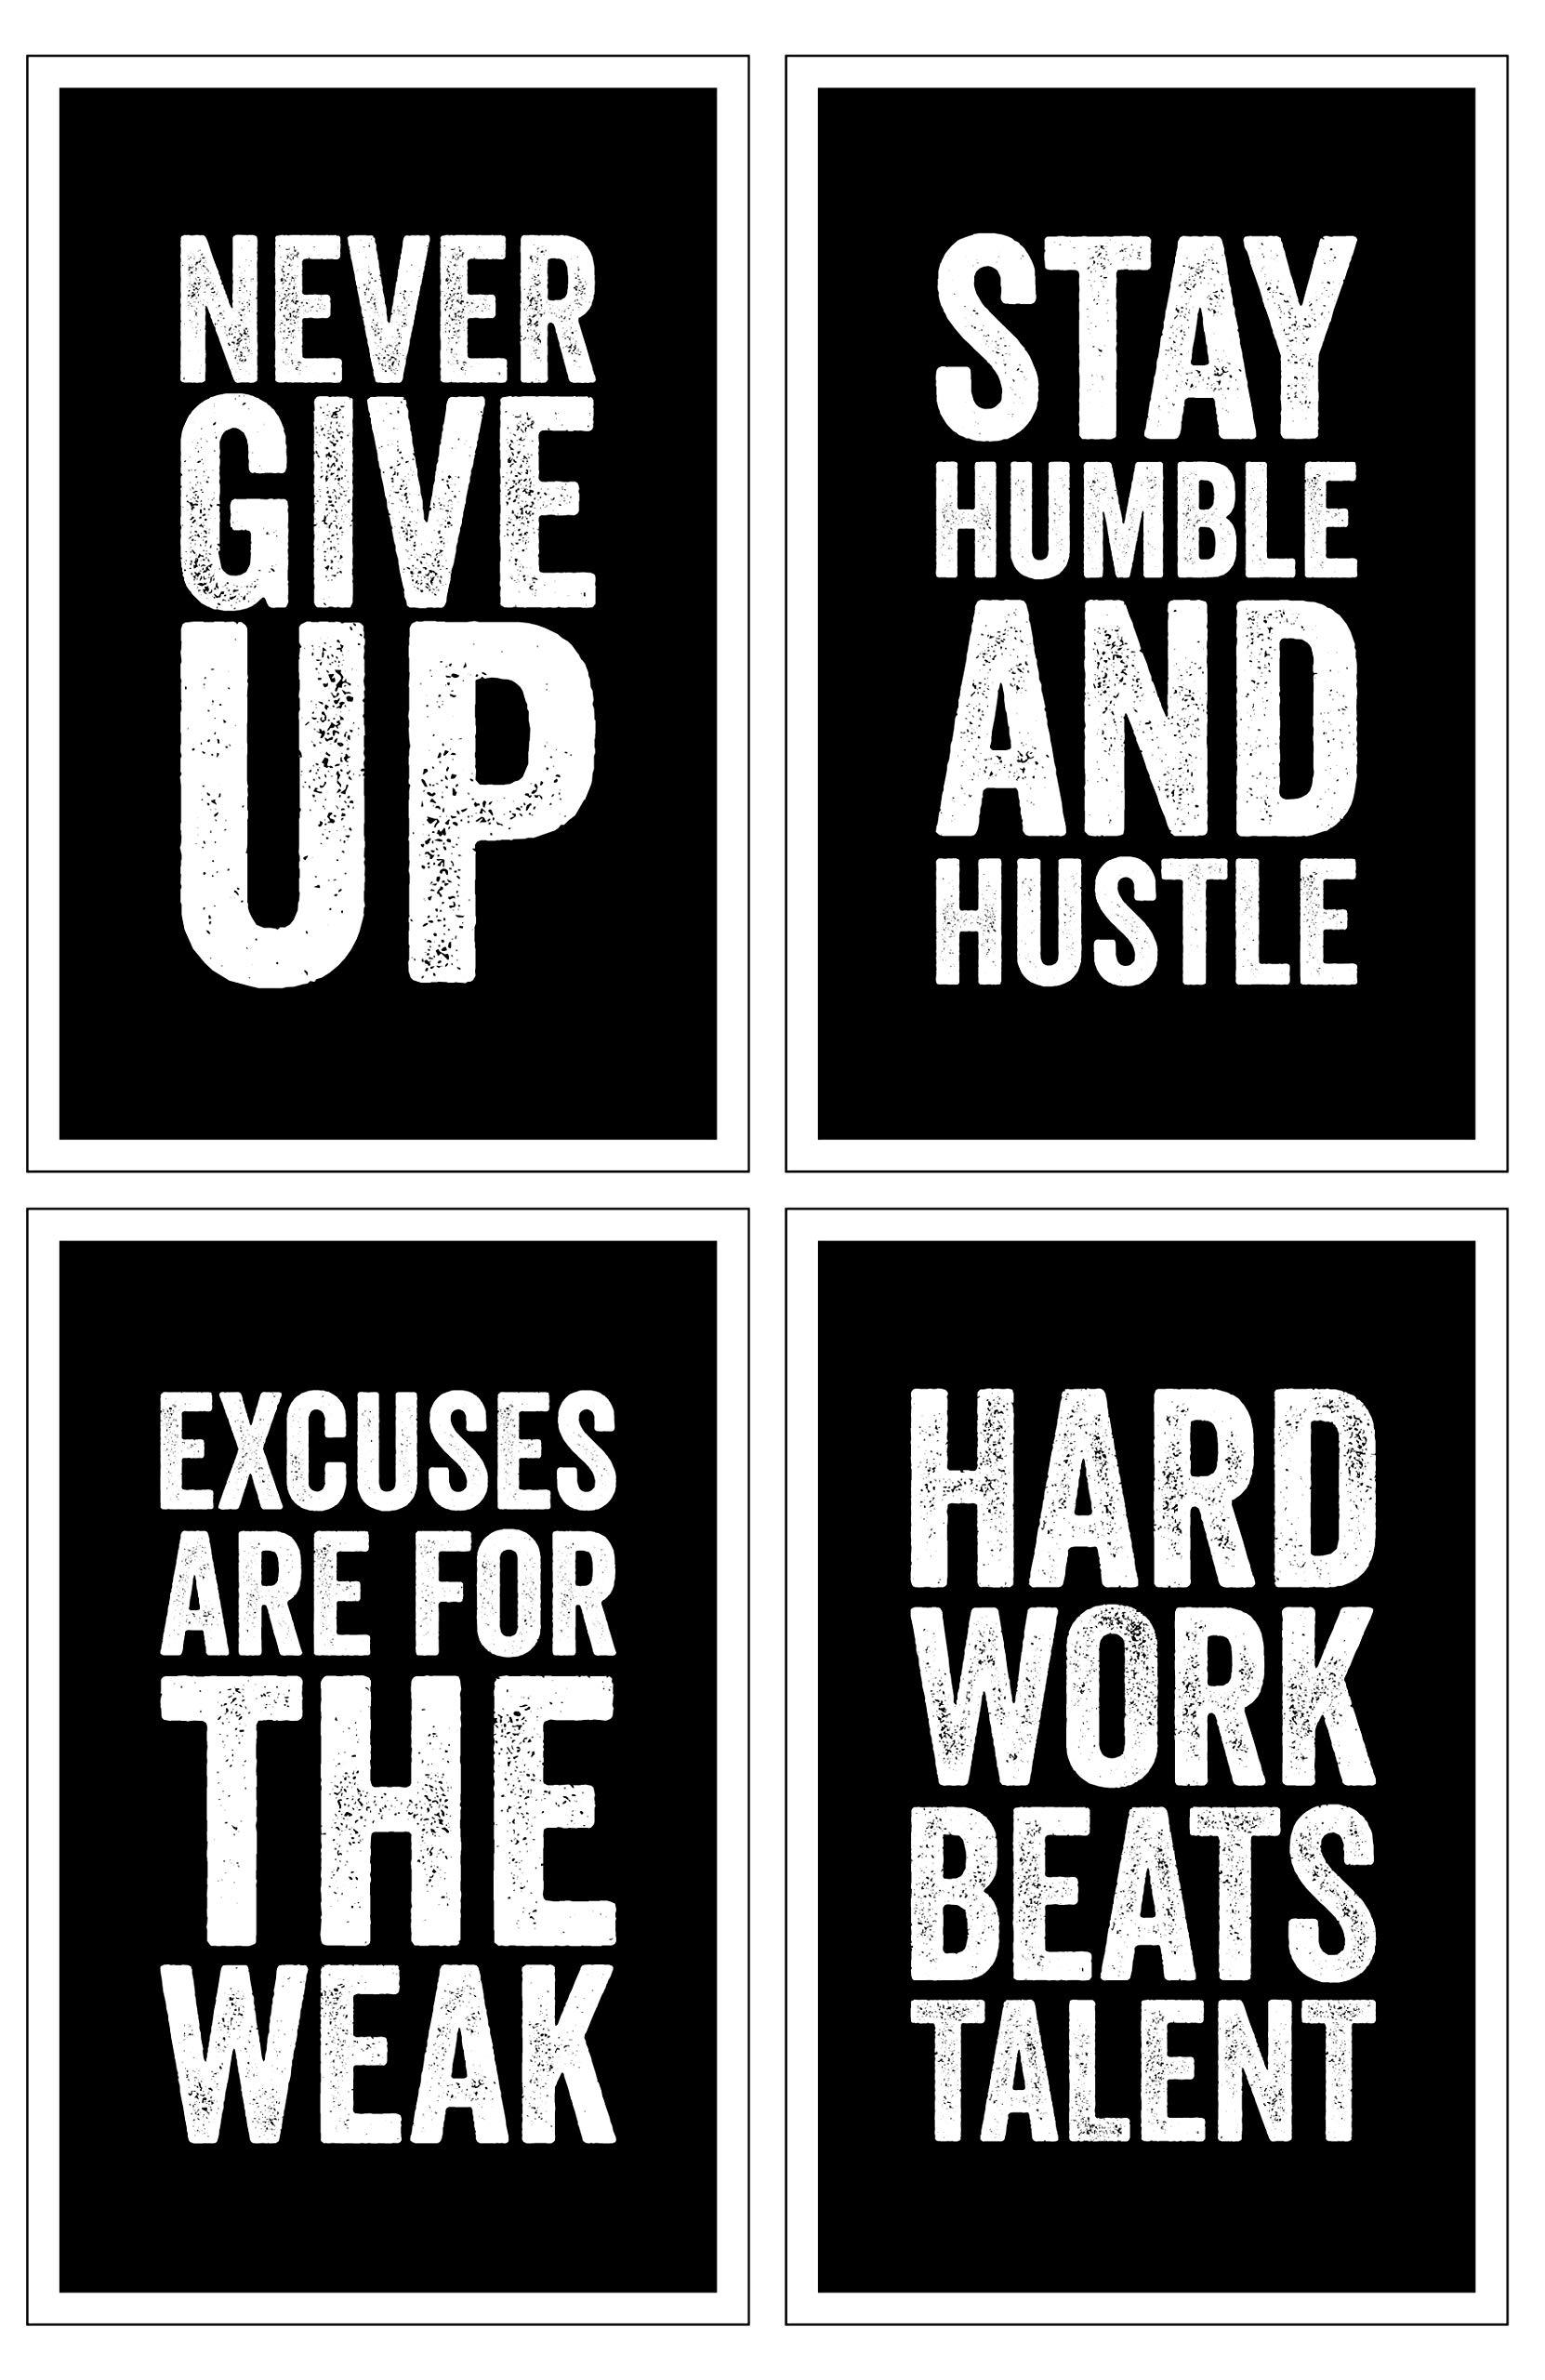 Damdekoli Motivational Posters, 11x17 Inches, Set of 4, Wall Art, Hustling, Entrepreneur Decoration, Inspirational Print Hustle by Damdekoli